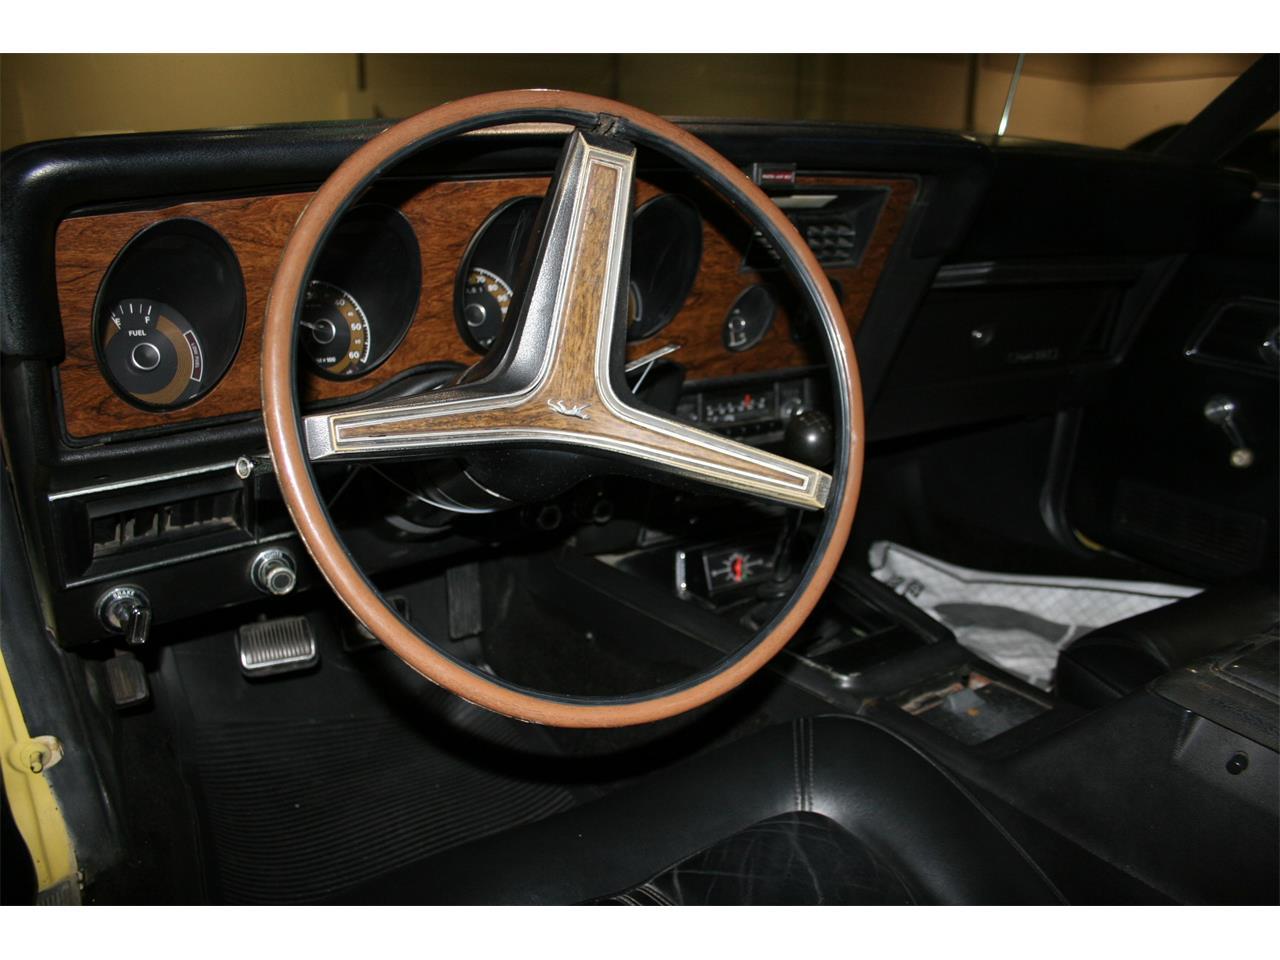 1972 Mercury Cougar XR7 (CC-1262066) for sale in Biloxi, Mississippi